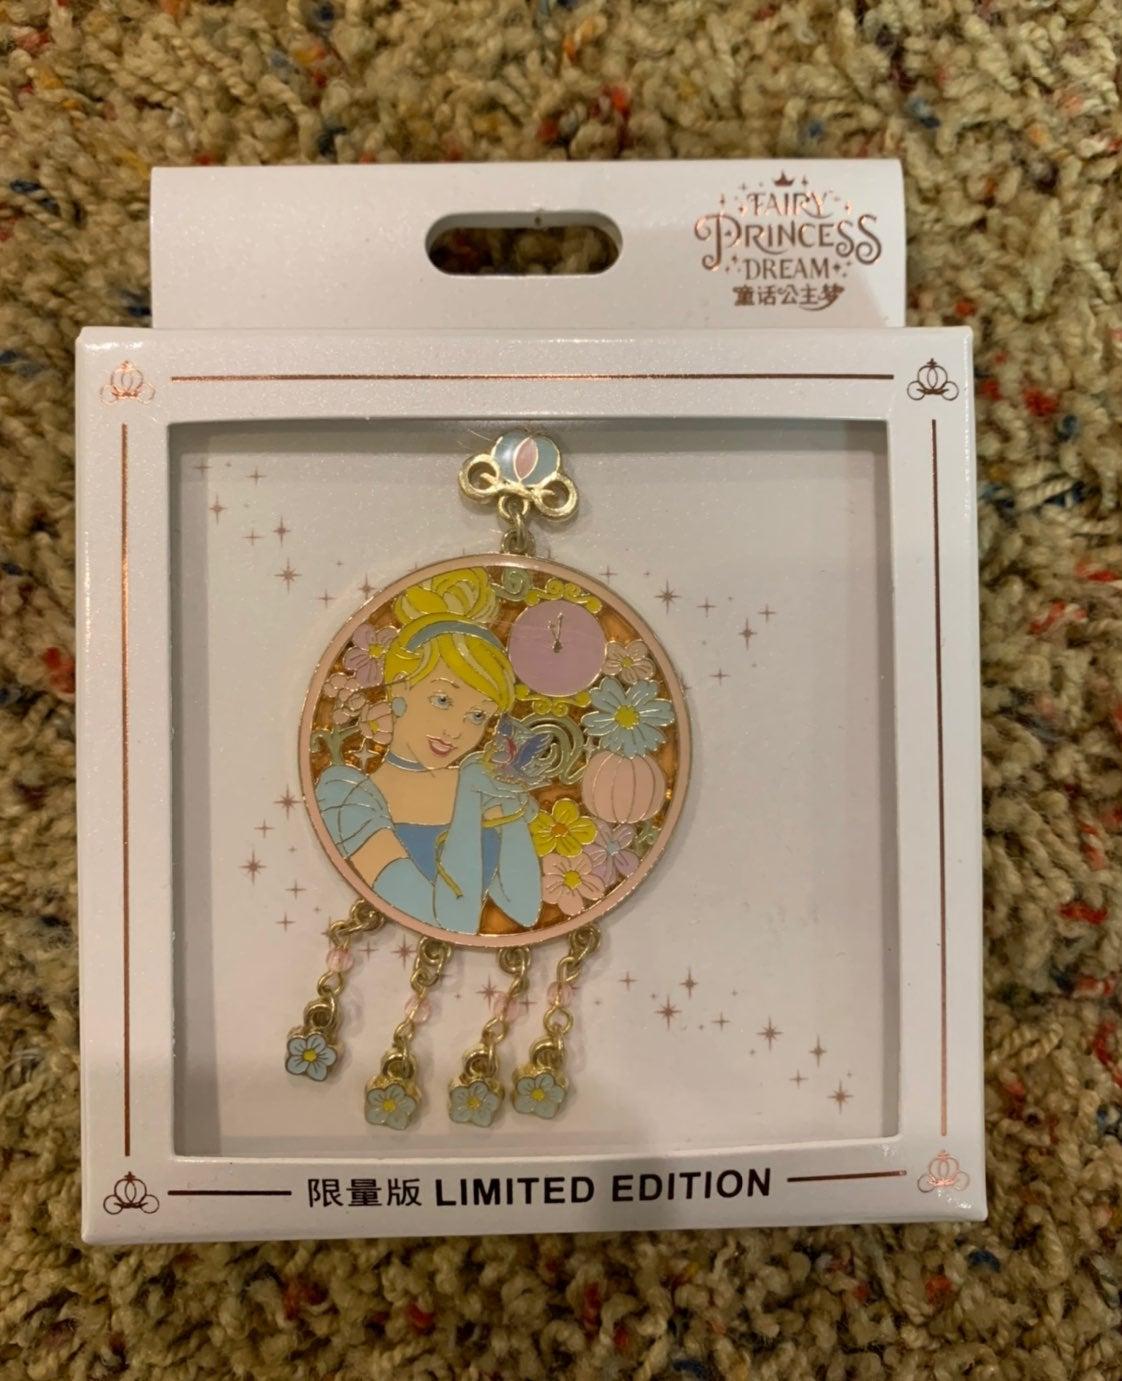 Cinderella pin